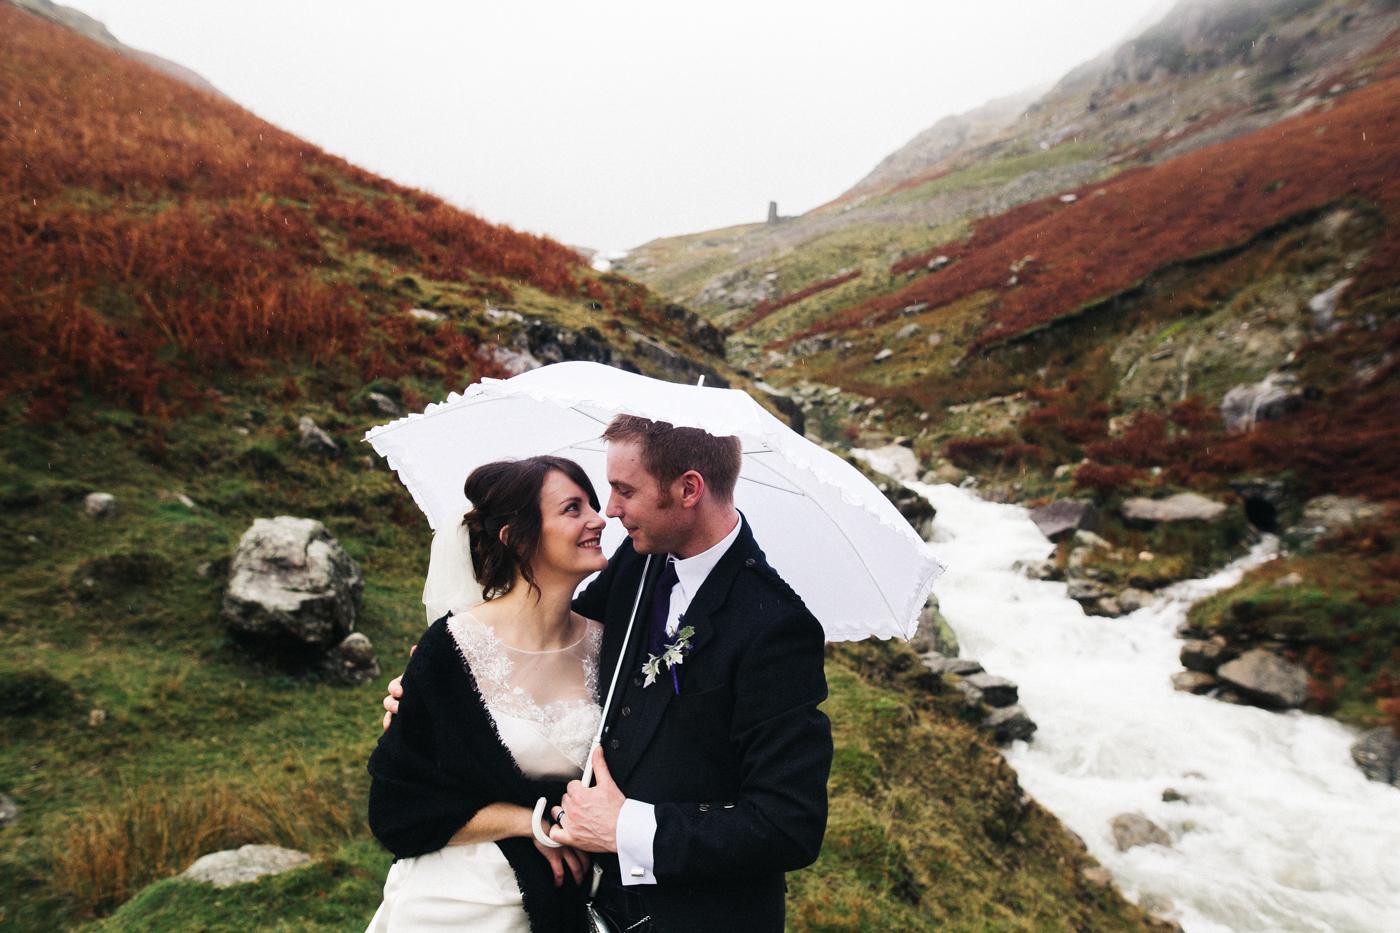 lake-district-coniston-wedding-photographer-photography-cumbria-coppermine-0027.jpg